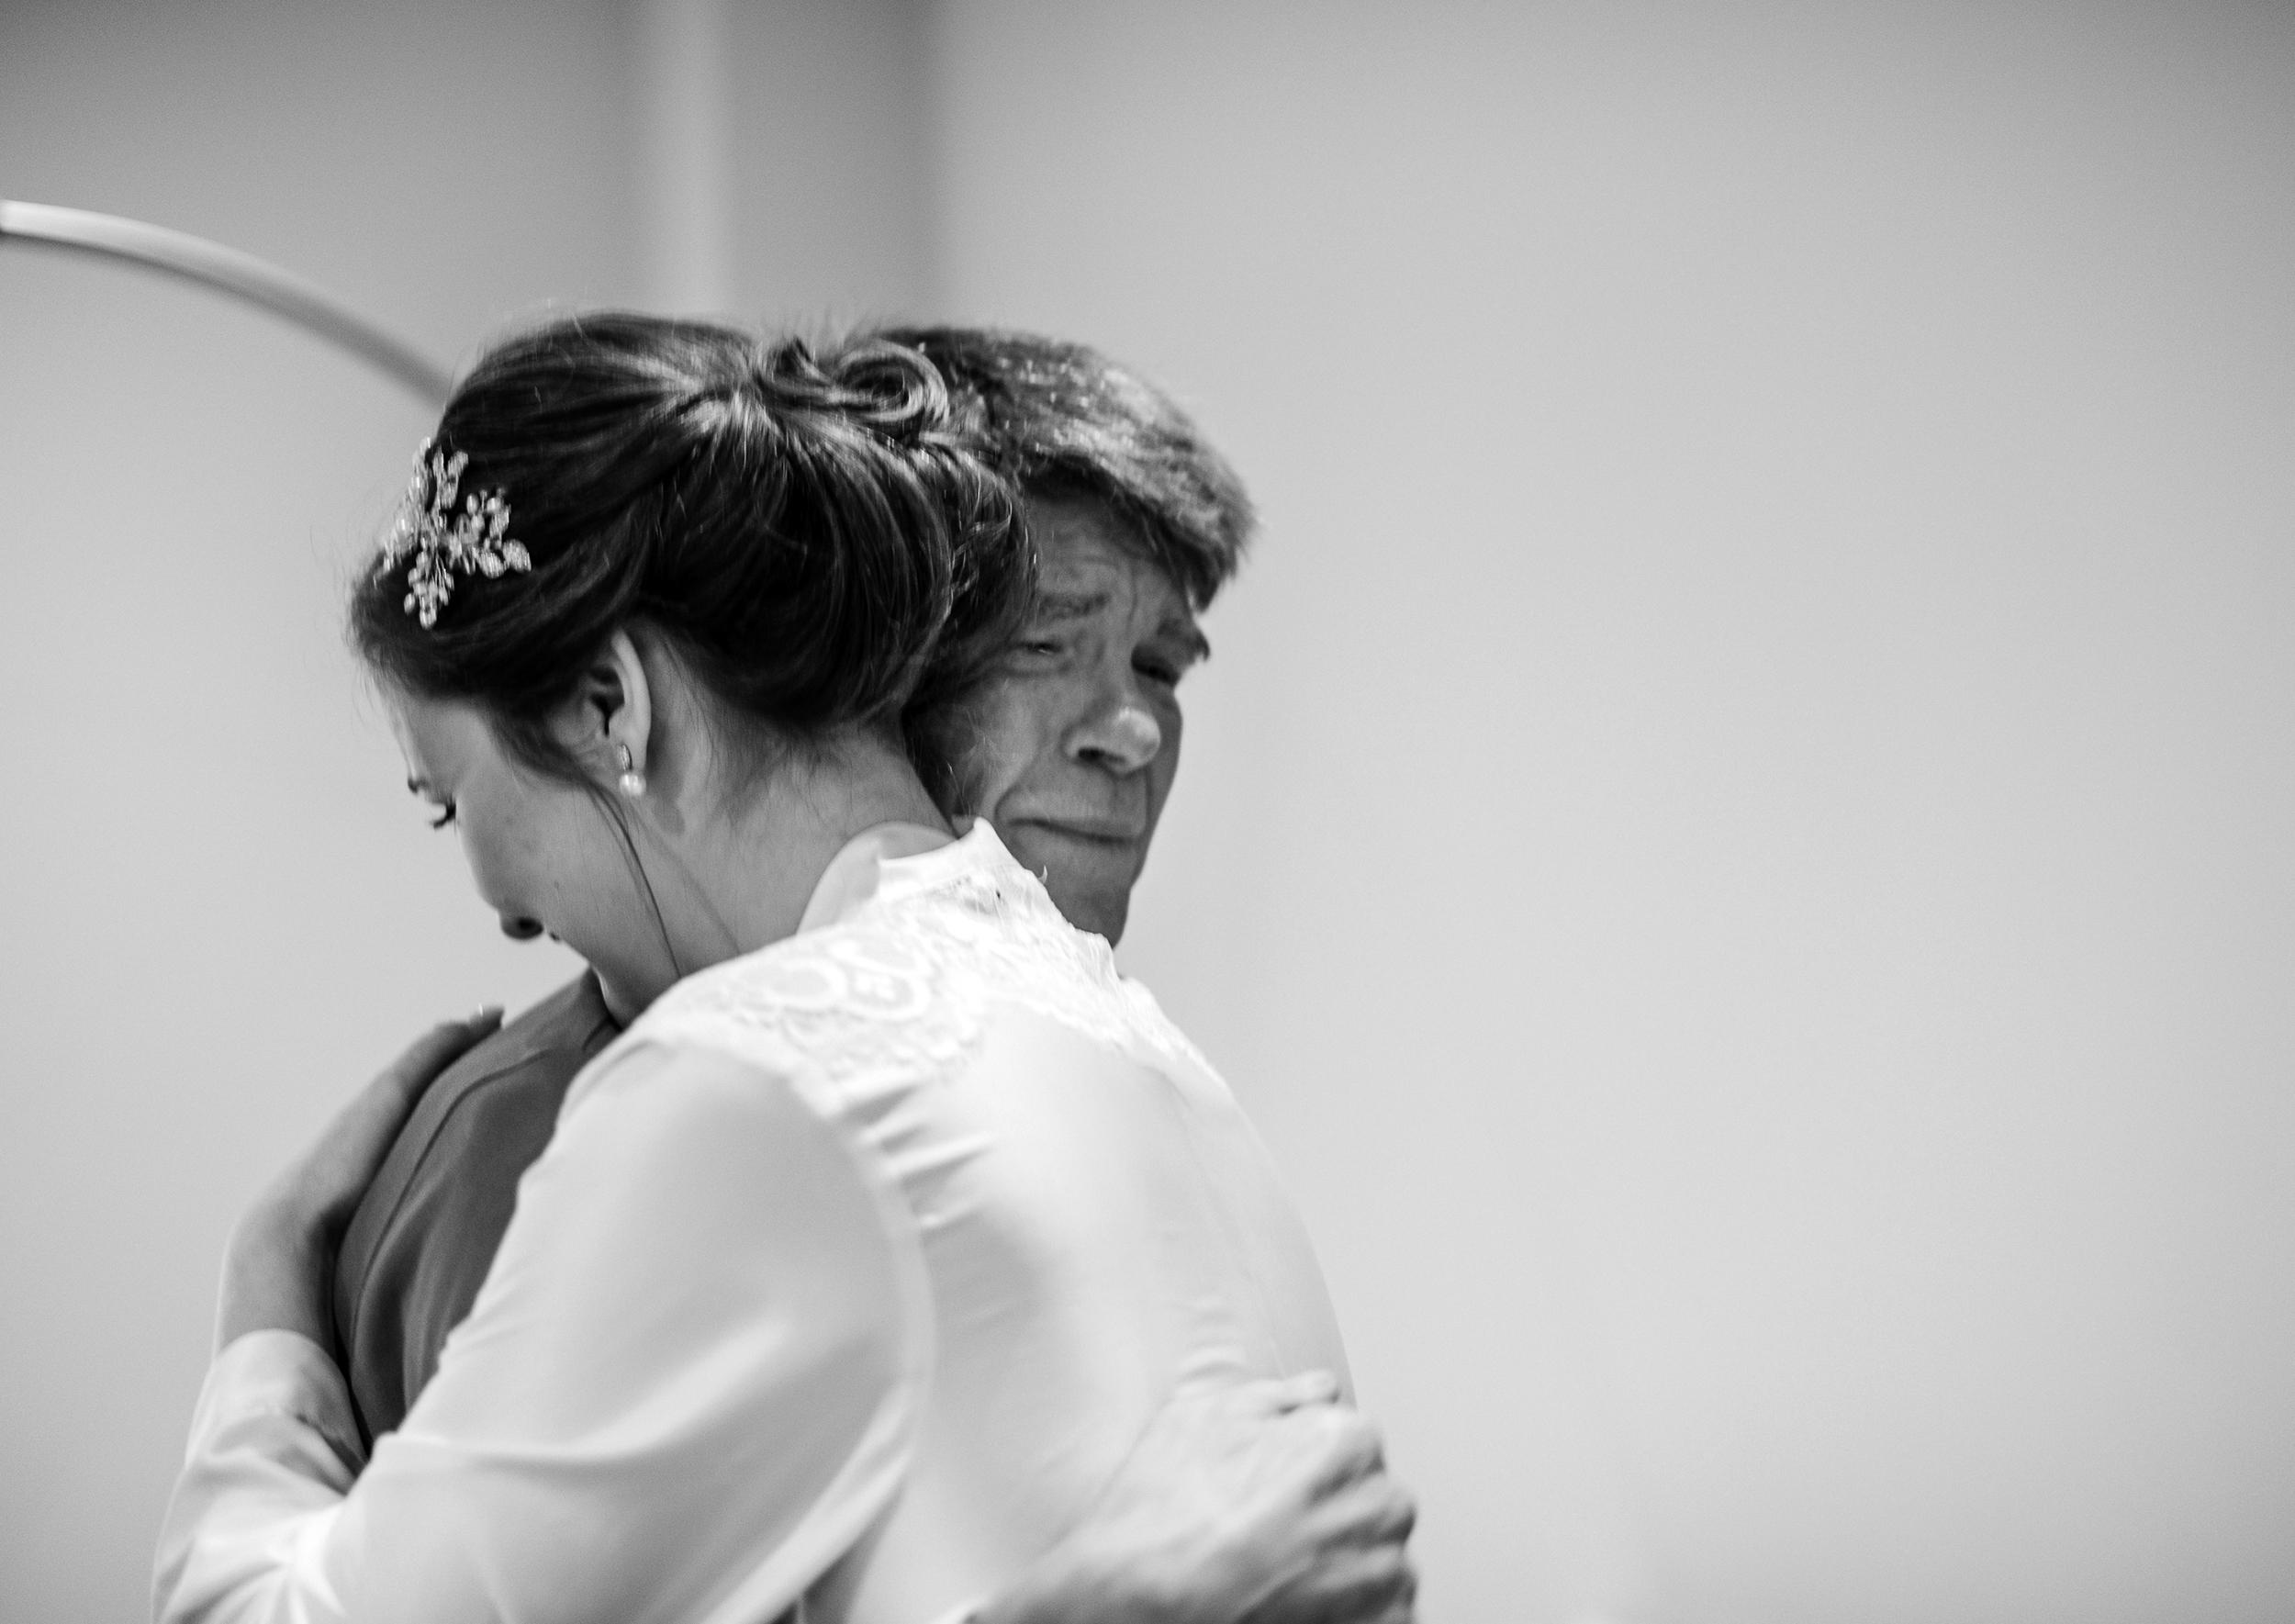 artistic female destination wedding photographer Natalia Poniatowska NPA Photography Warsaw